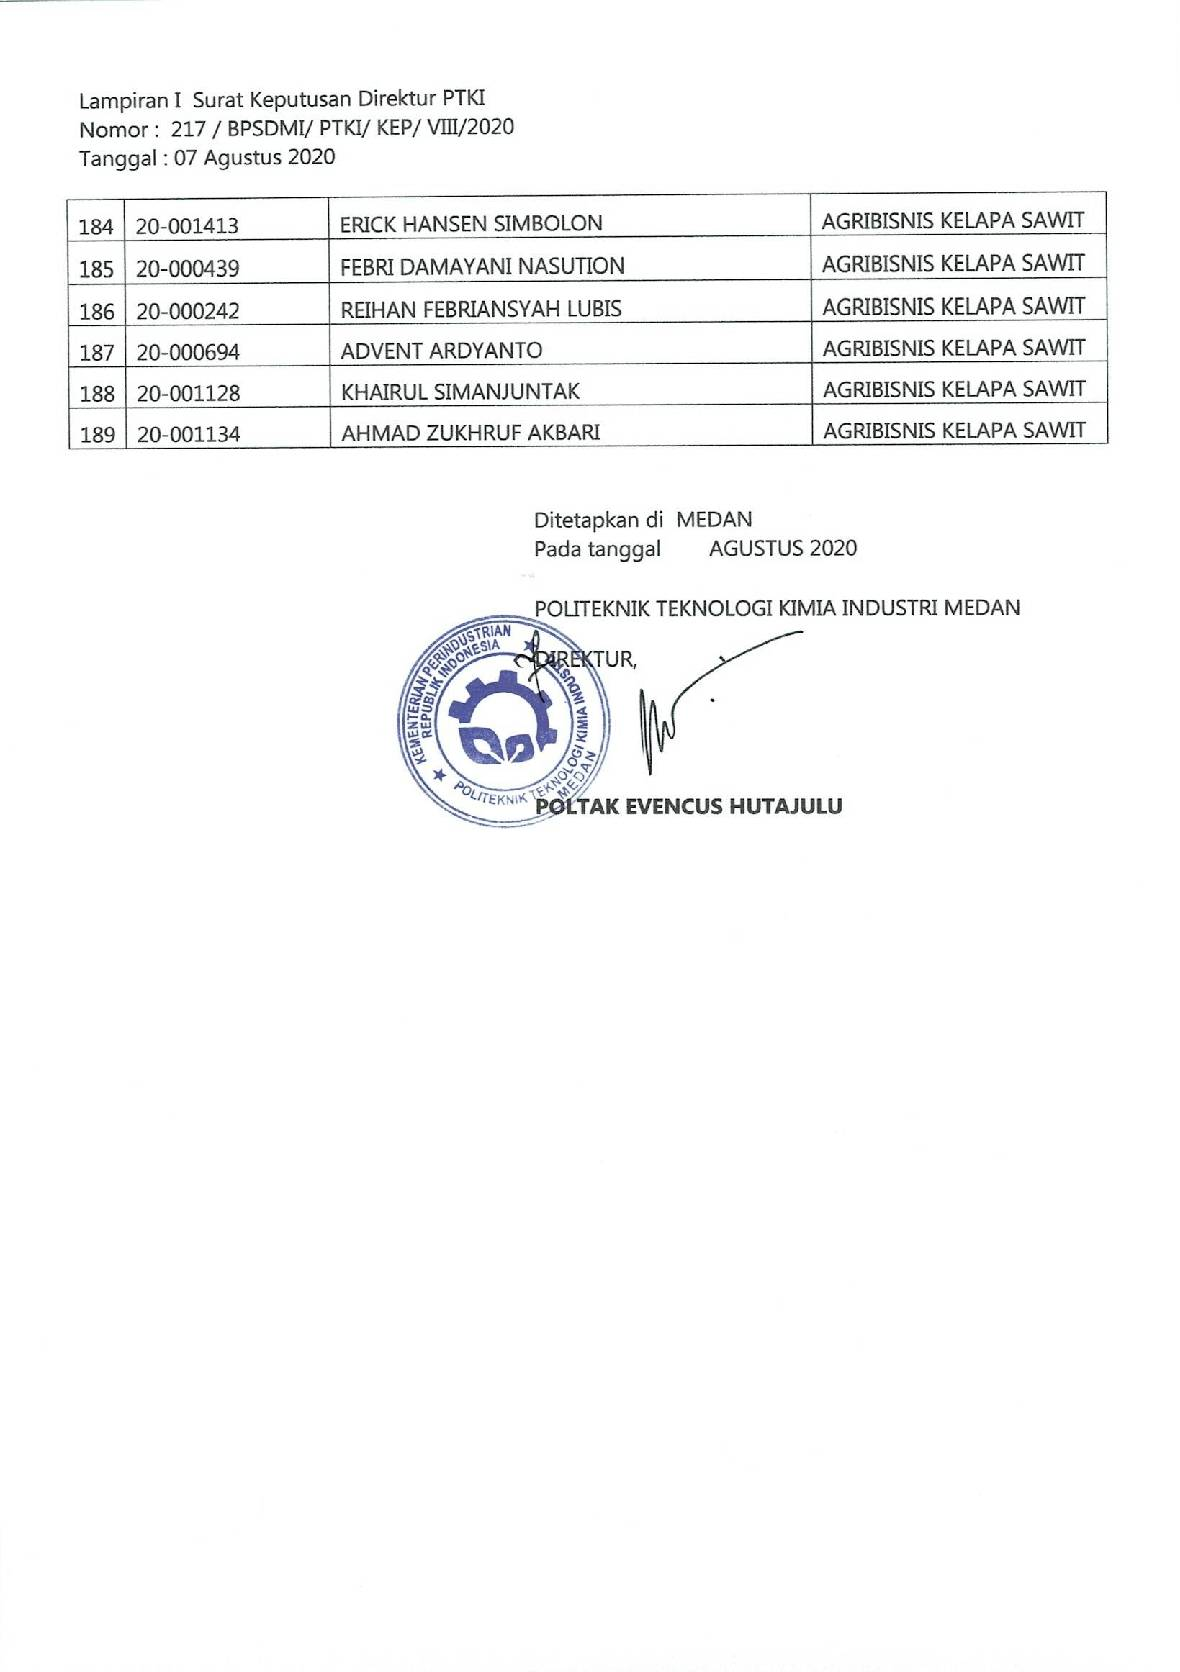 PENGUMUMAN JARVIS MANDIRI 20209